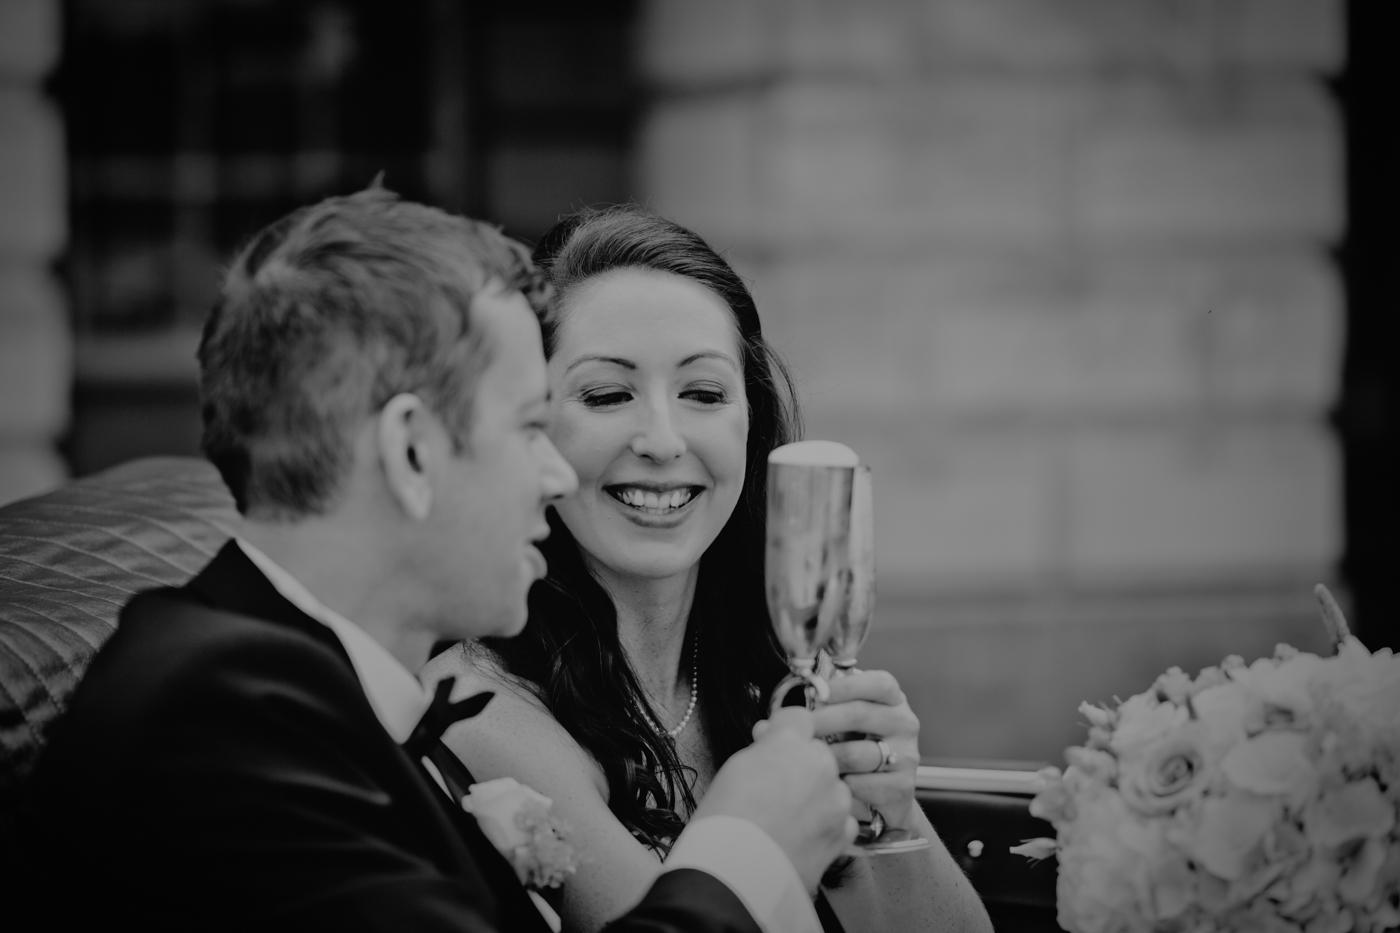 114 - Abi and Chris at Kedleston Hall - Wedding Photography by Mark Pugh www.markpugh.com - 0280.JPG